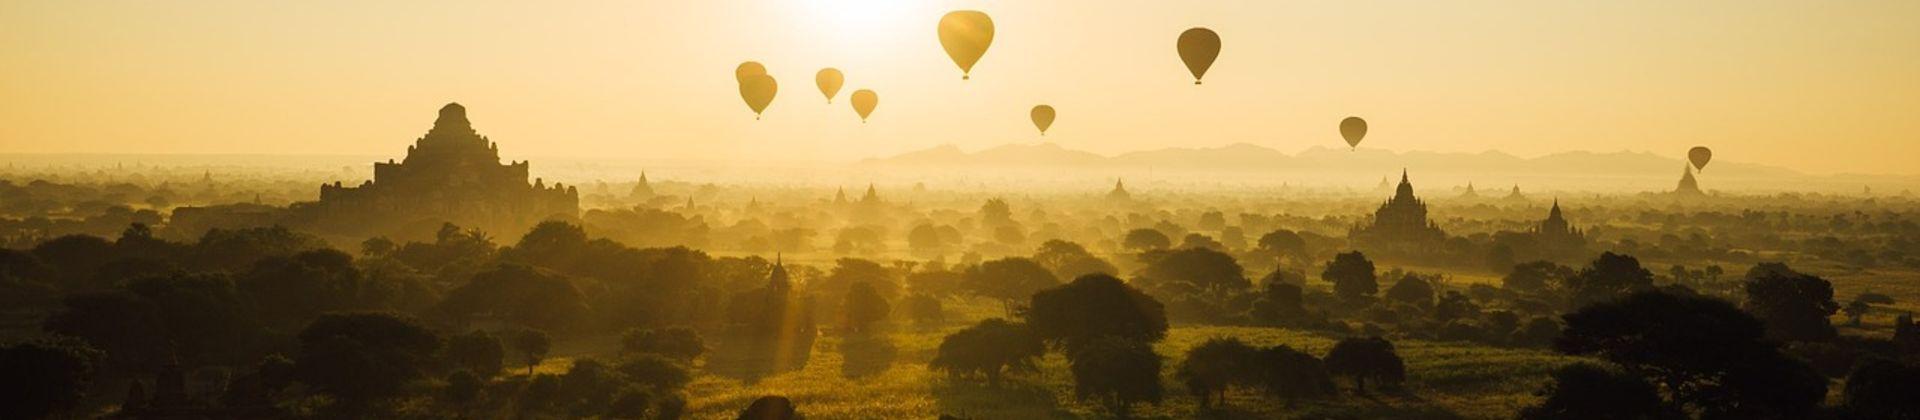 Premier envoûtement en Birmanie